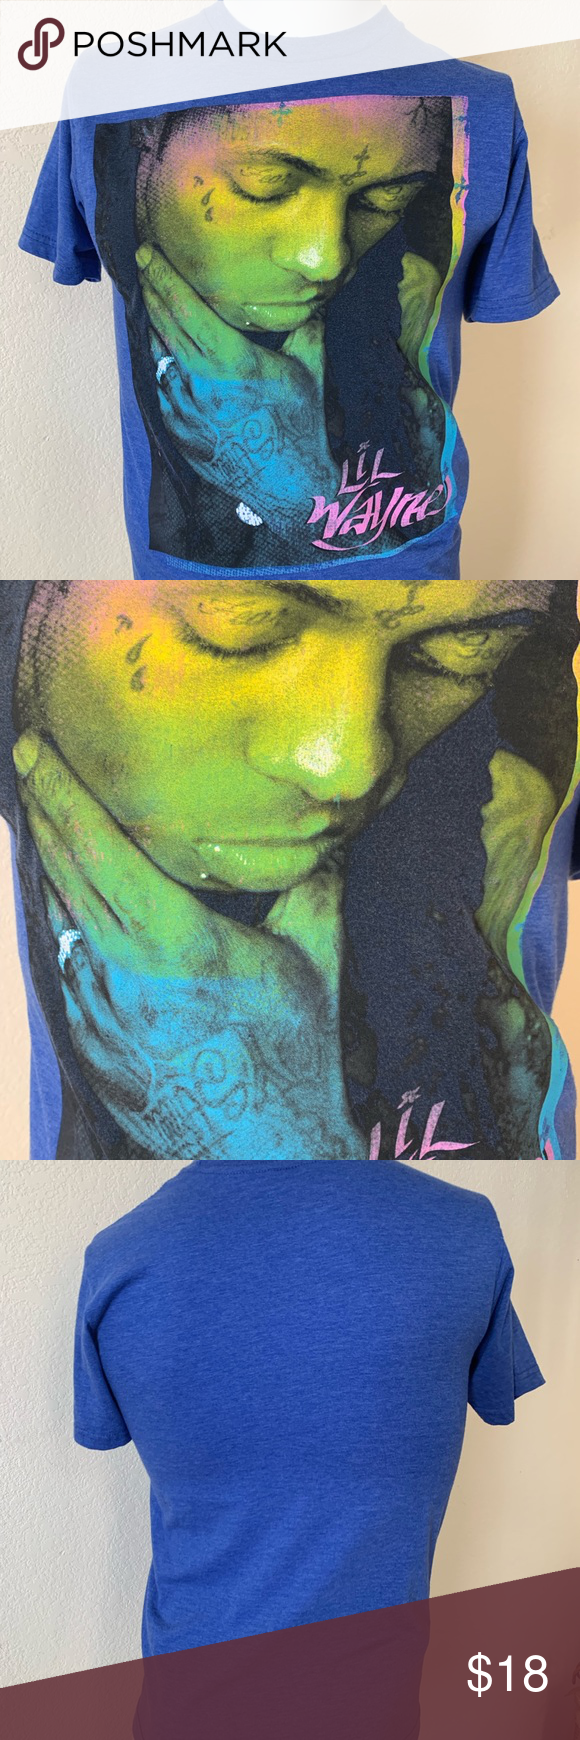 Live Nation Lil Wayne T-shirt Live nation merchandise lil Wayne great condition awesome graphics tee shirt Shirts Tees - Short Sleeve #lilwayne Live Nation Lil Wayne T-shirt Live nation merchandise lil Wayne great condition awesome graphics tee shirt Shirts Tees - Short Sleeve #lilwayne